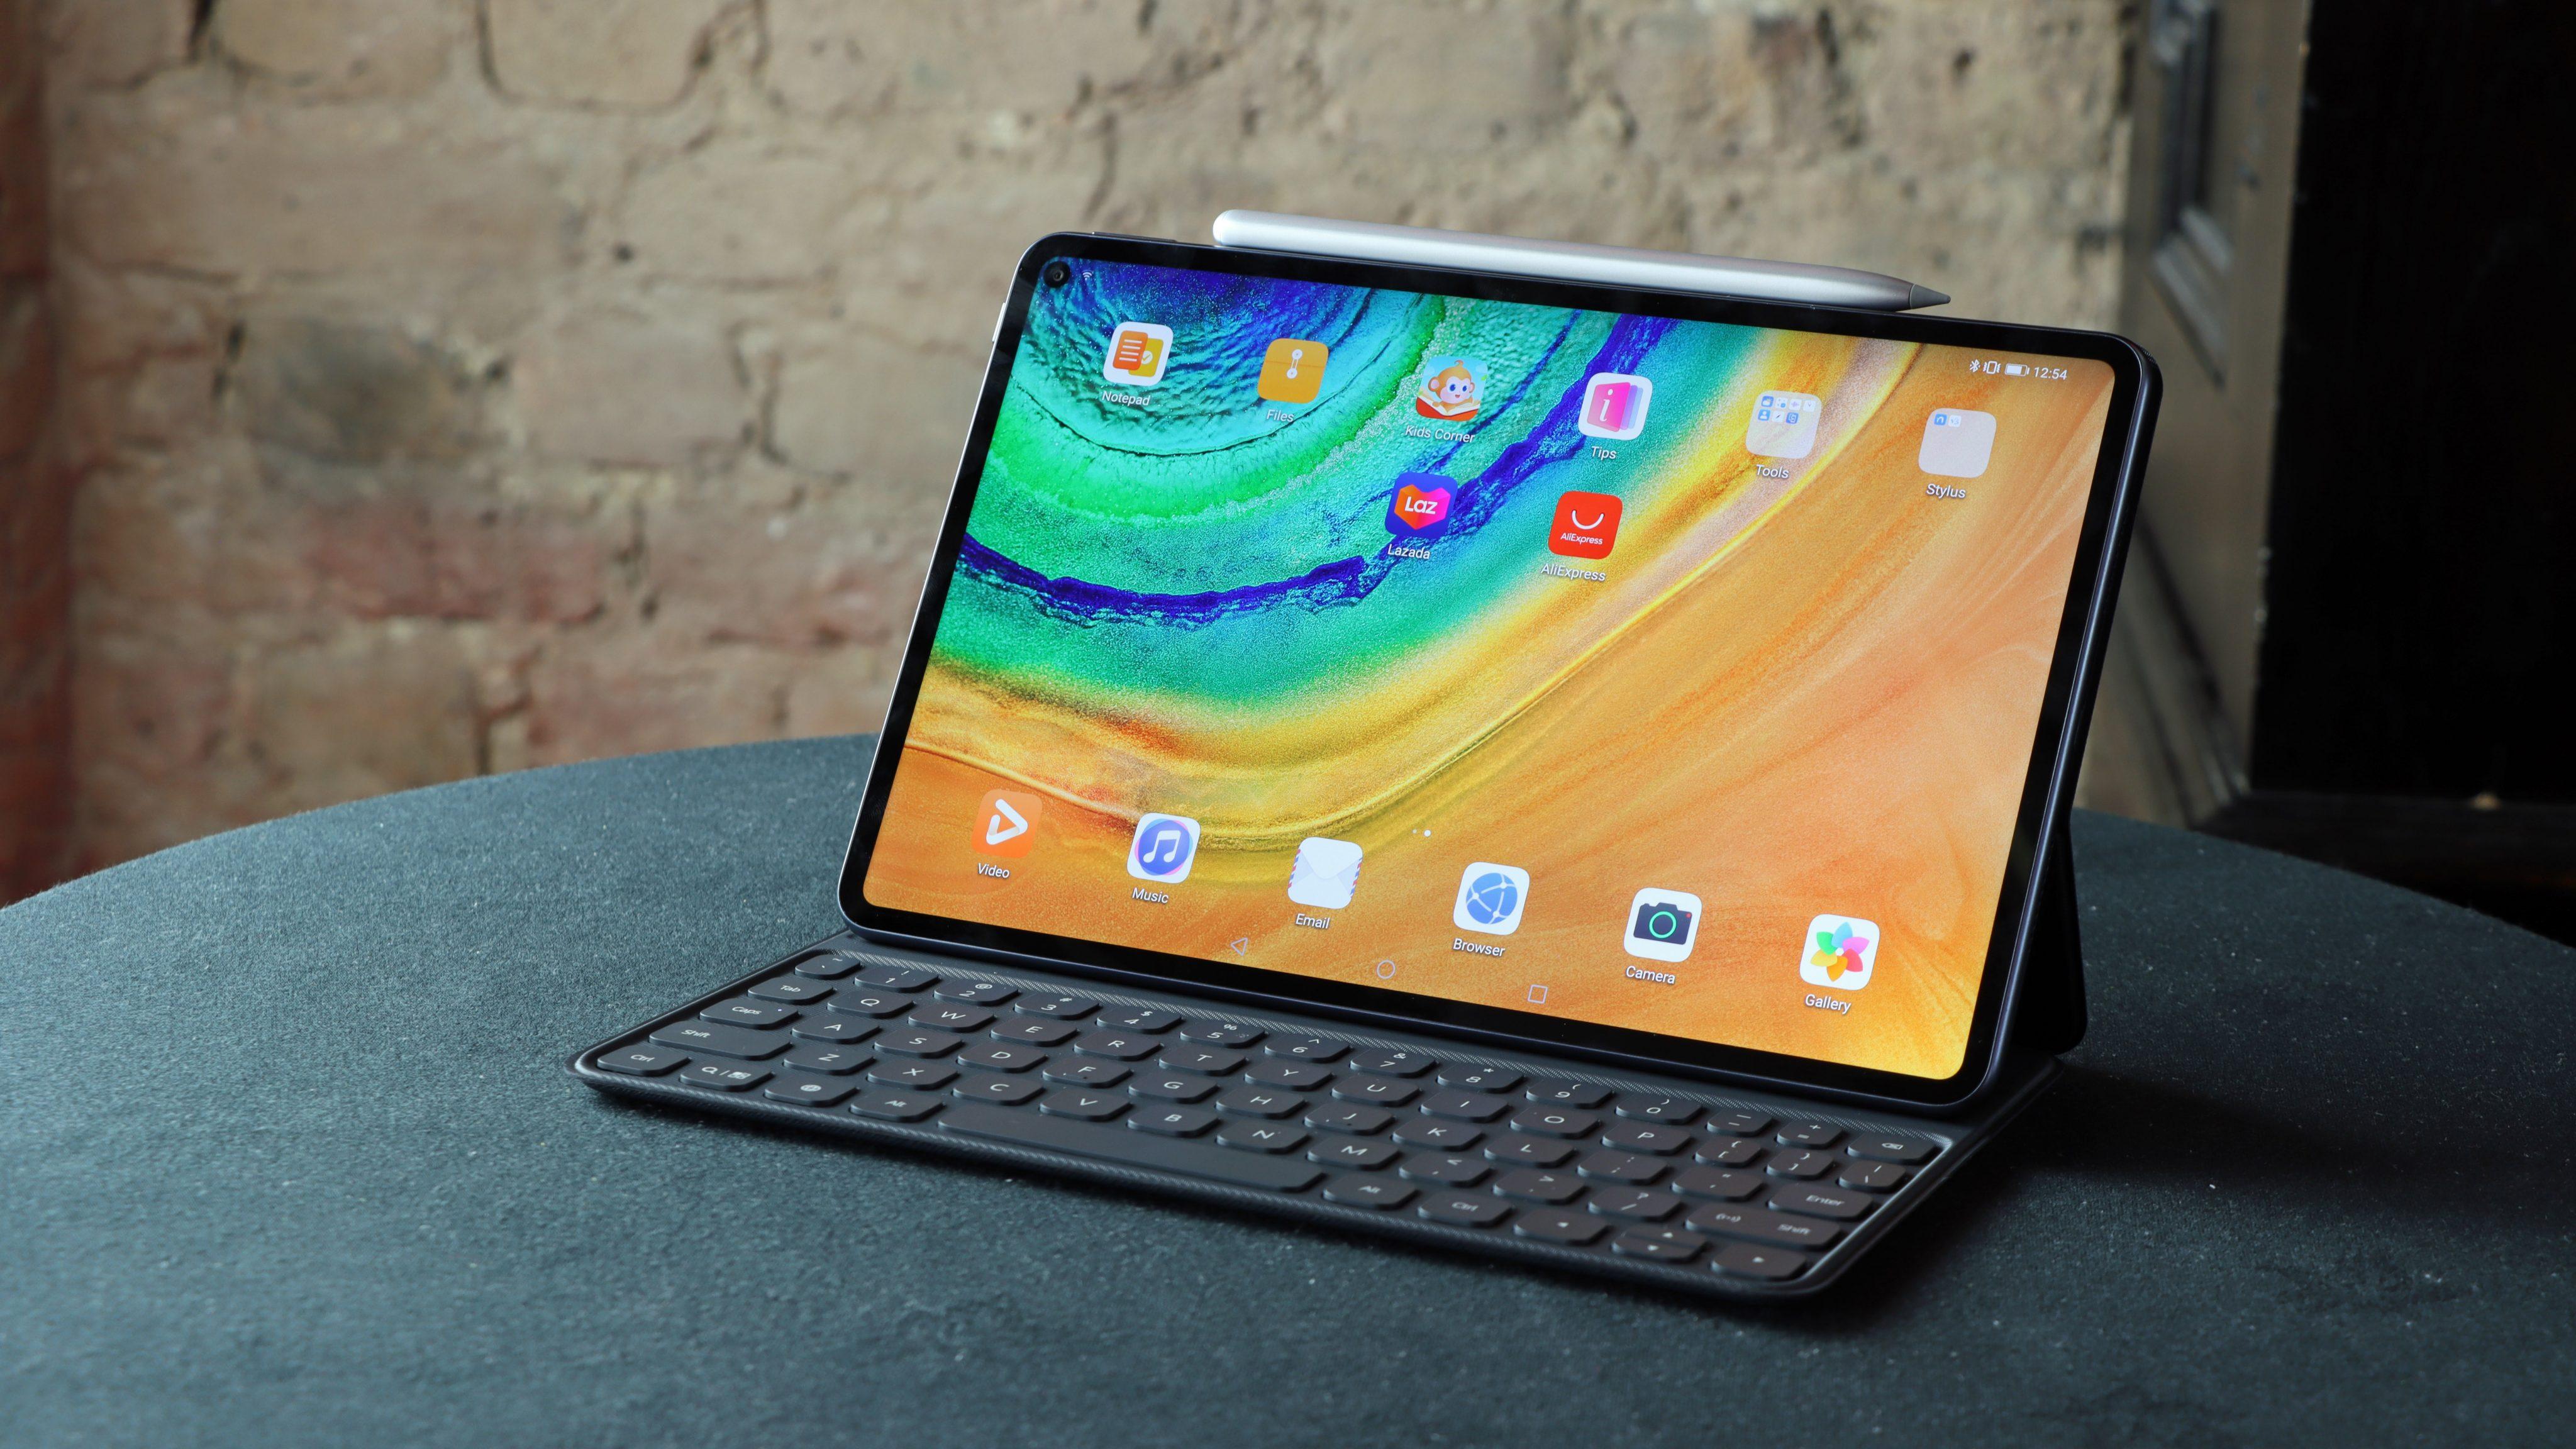 Huawei готовит к выходу планшеты MatePad 2 и MatePad Pro 2: новинки получат AMOLED-дисплеи на 120 Гц и динамики Harman Kardon